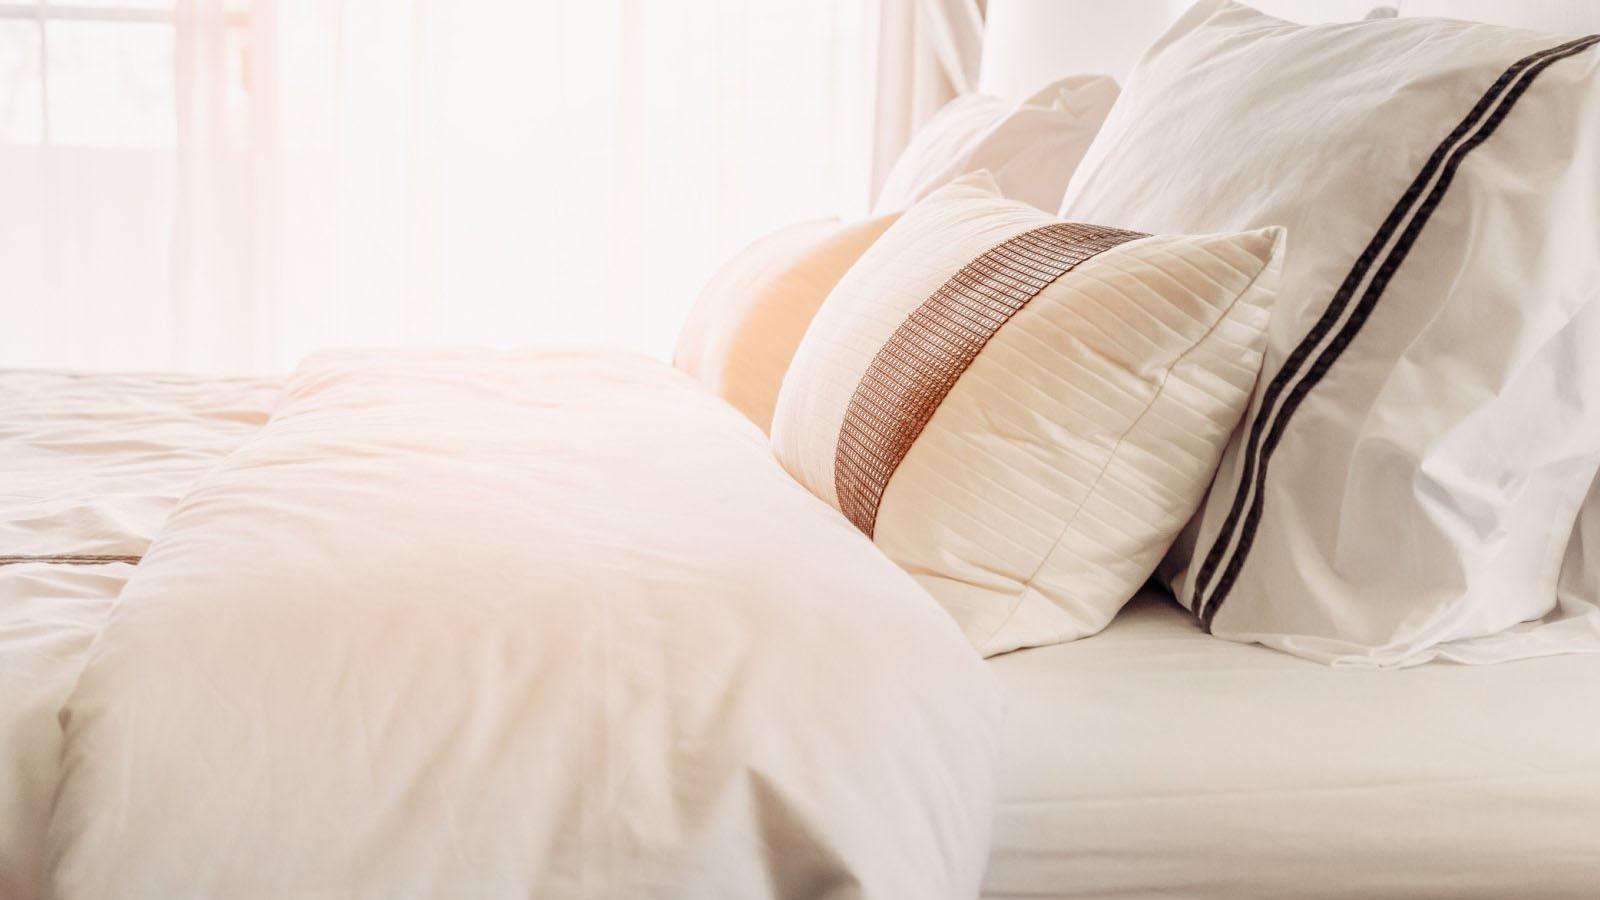 bed bug treatment testimonials bournemouth swindown taunton worthing bristol southampton dorset hampshire